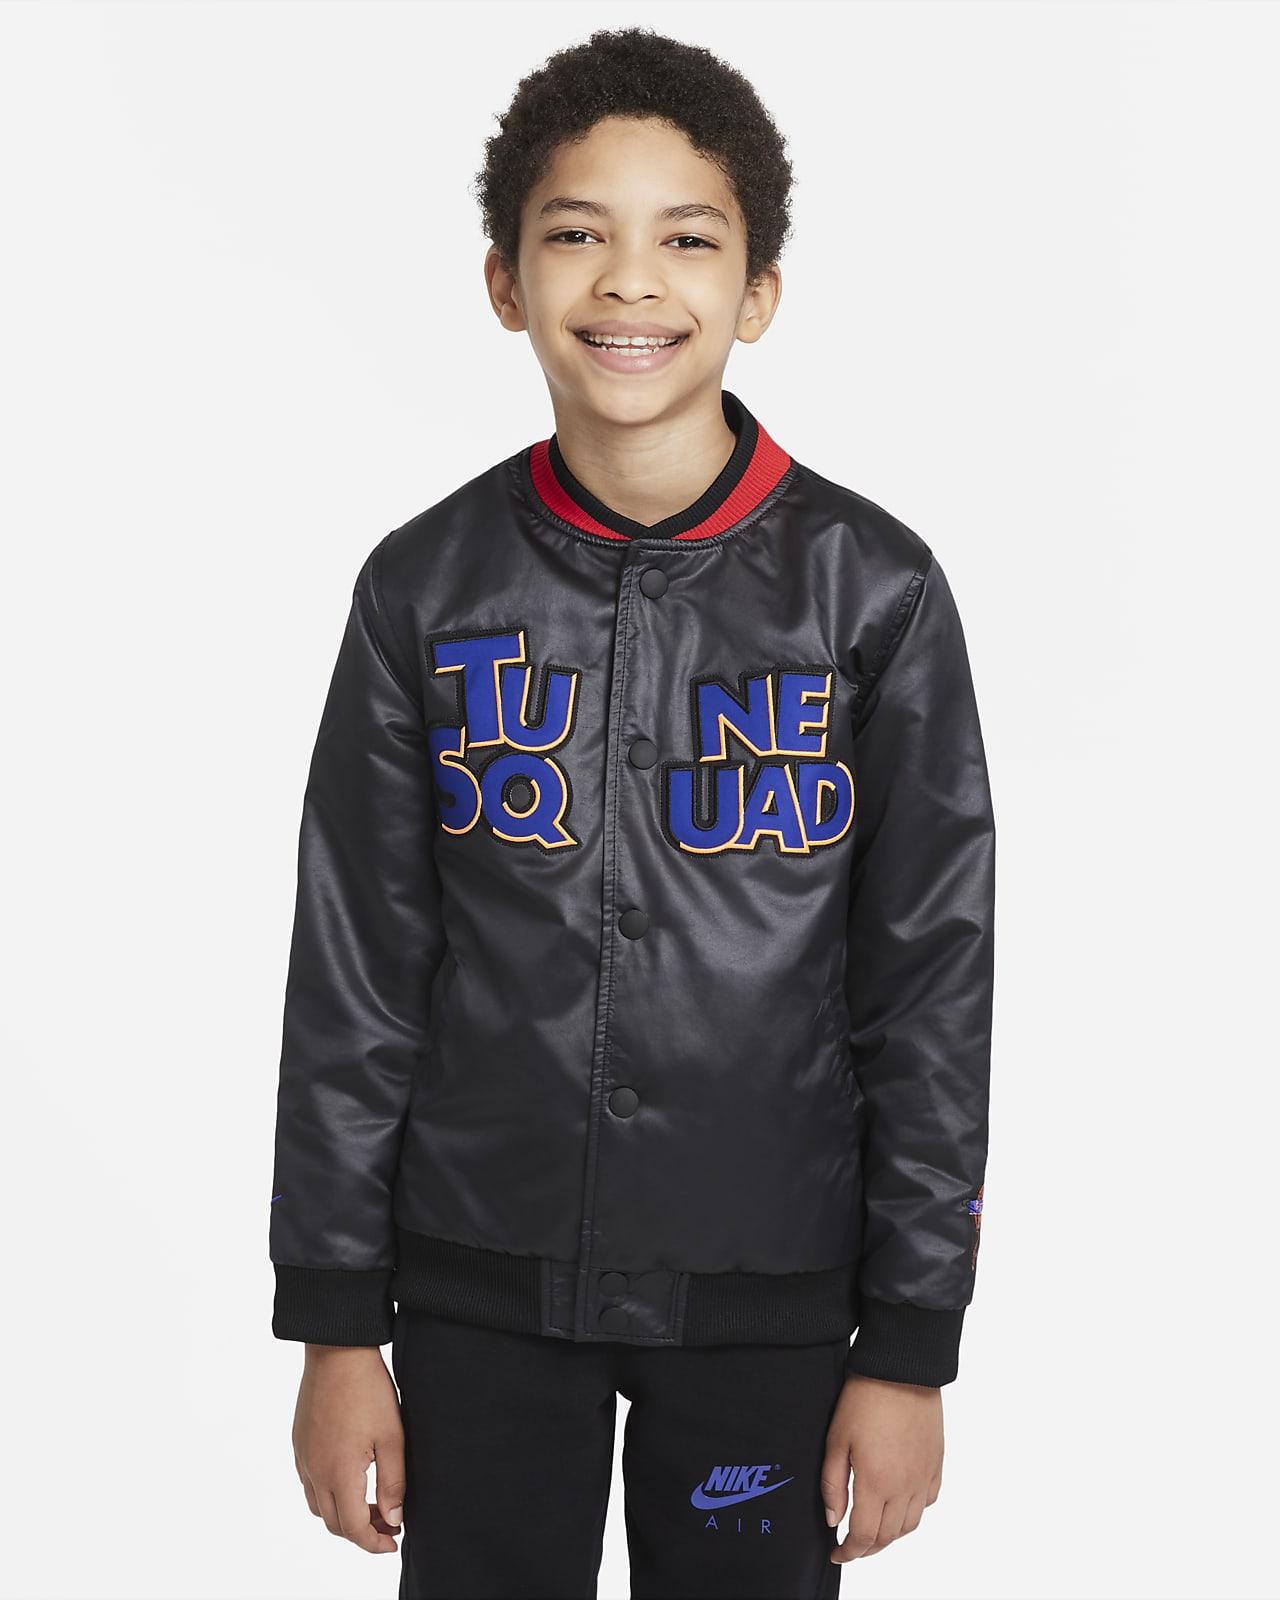 Nike x Space Jam: A New Legacy Older Kids' Jacket